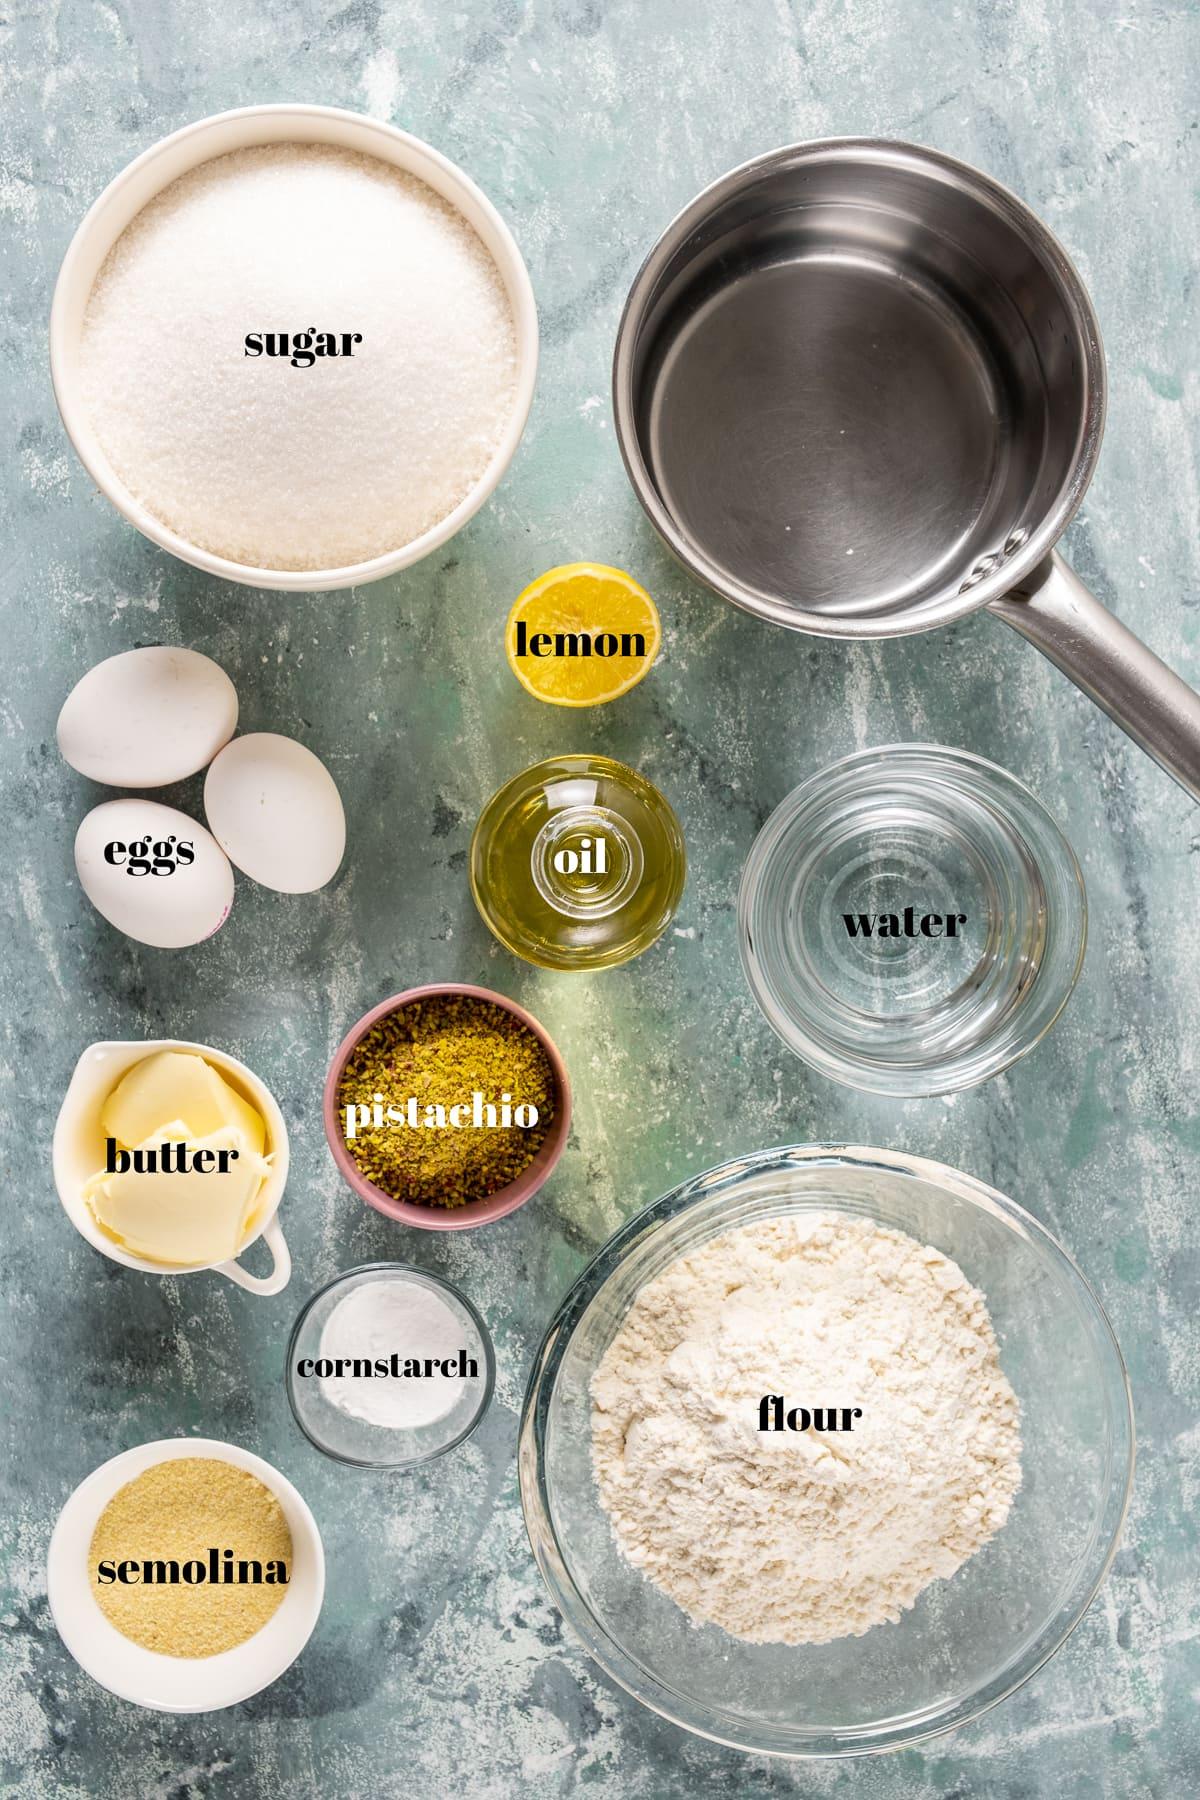 Flour, sugar, semolina, eggs, oil, pistachios, butter, lemon, cornstarch photographed on a light background.